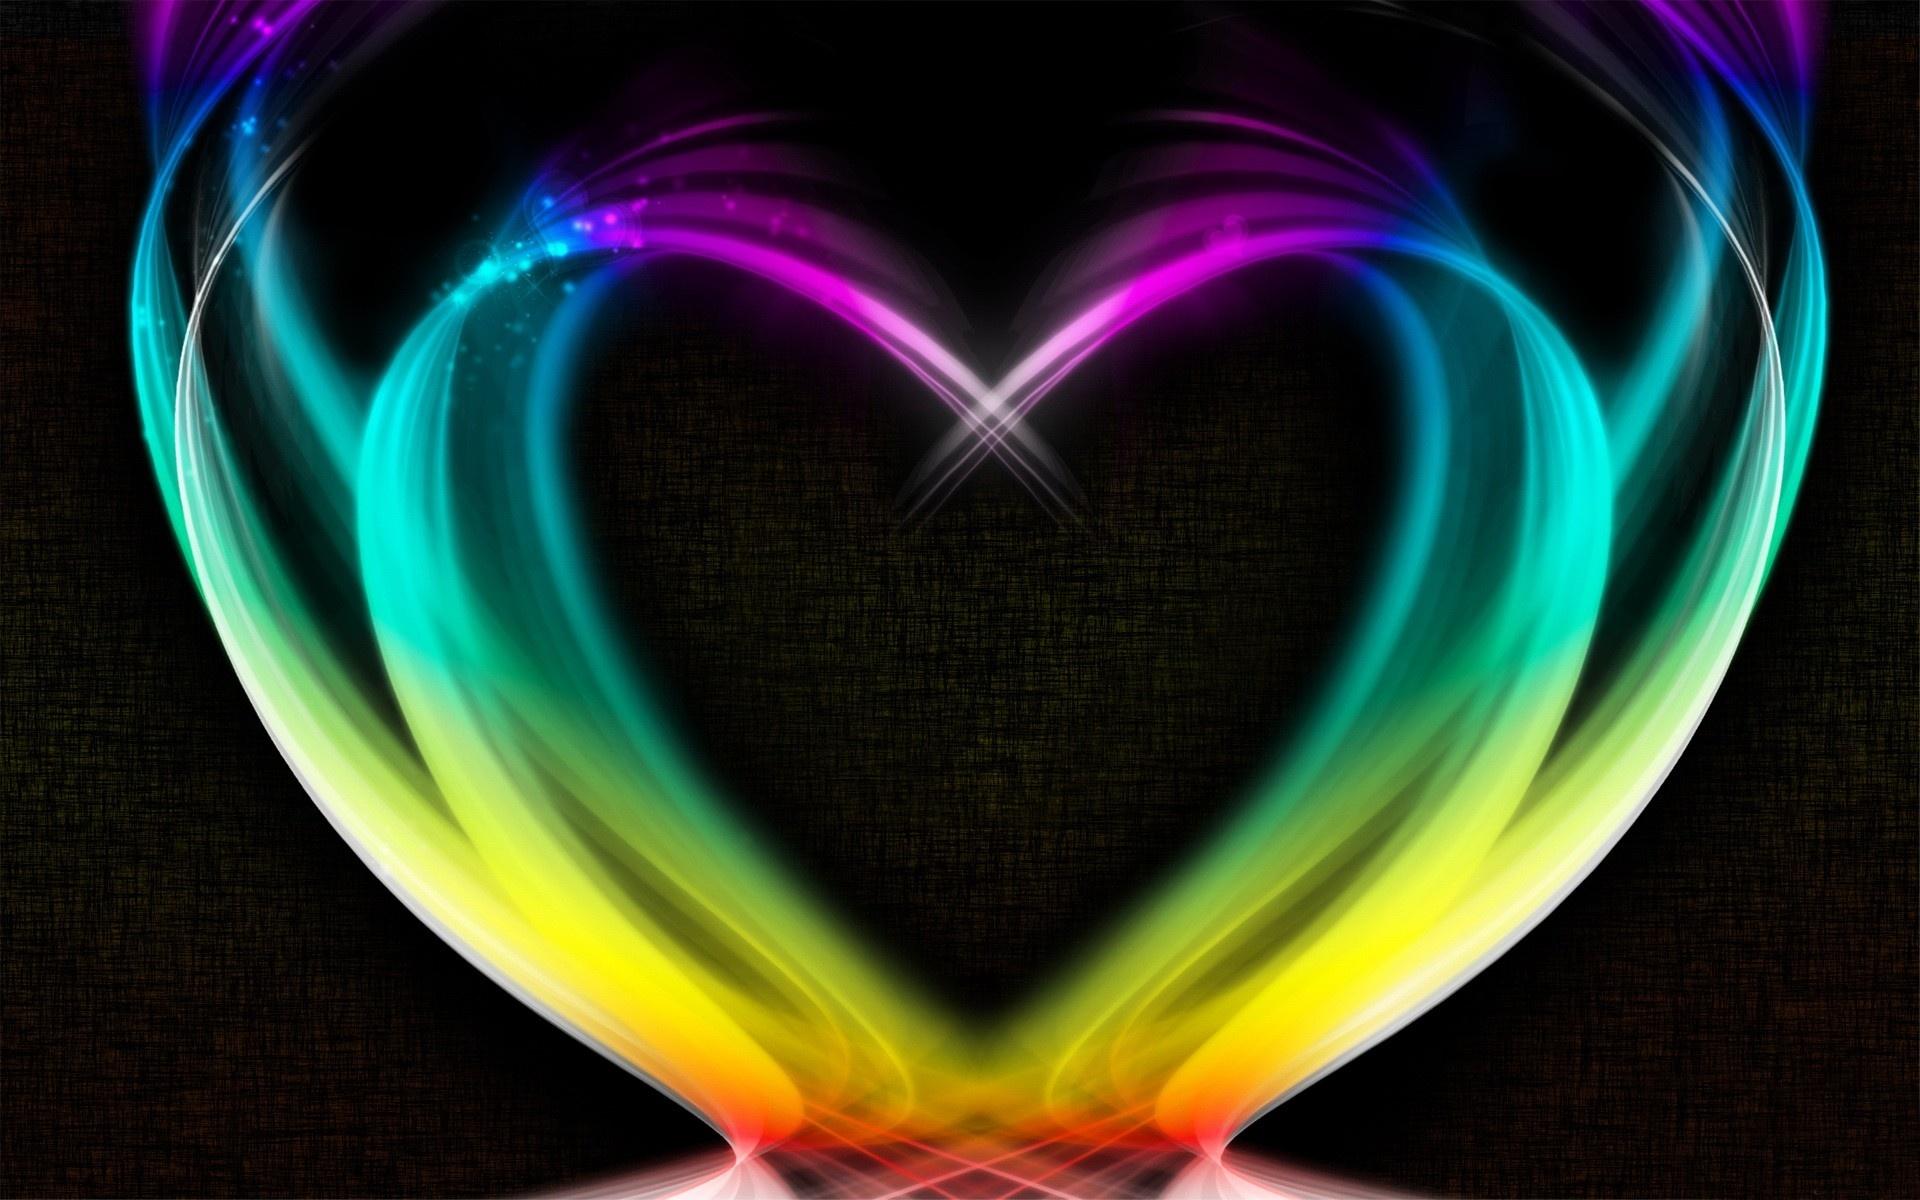 Wallpaper Abstract Love Heart Colorful Smoke Creative 1920x1200 Hd